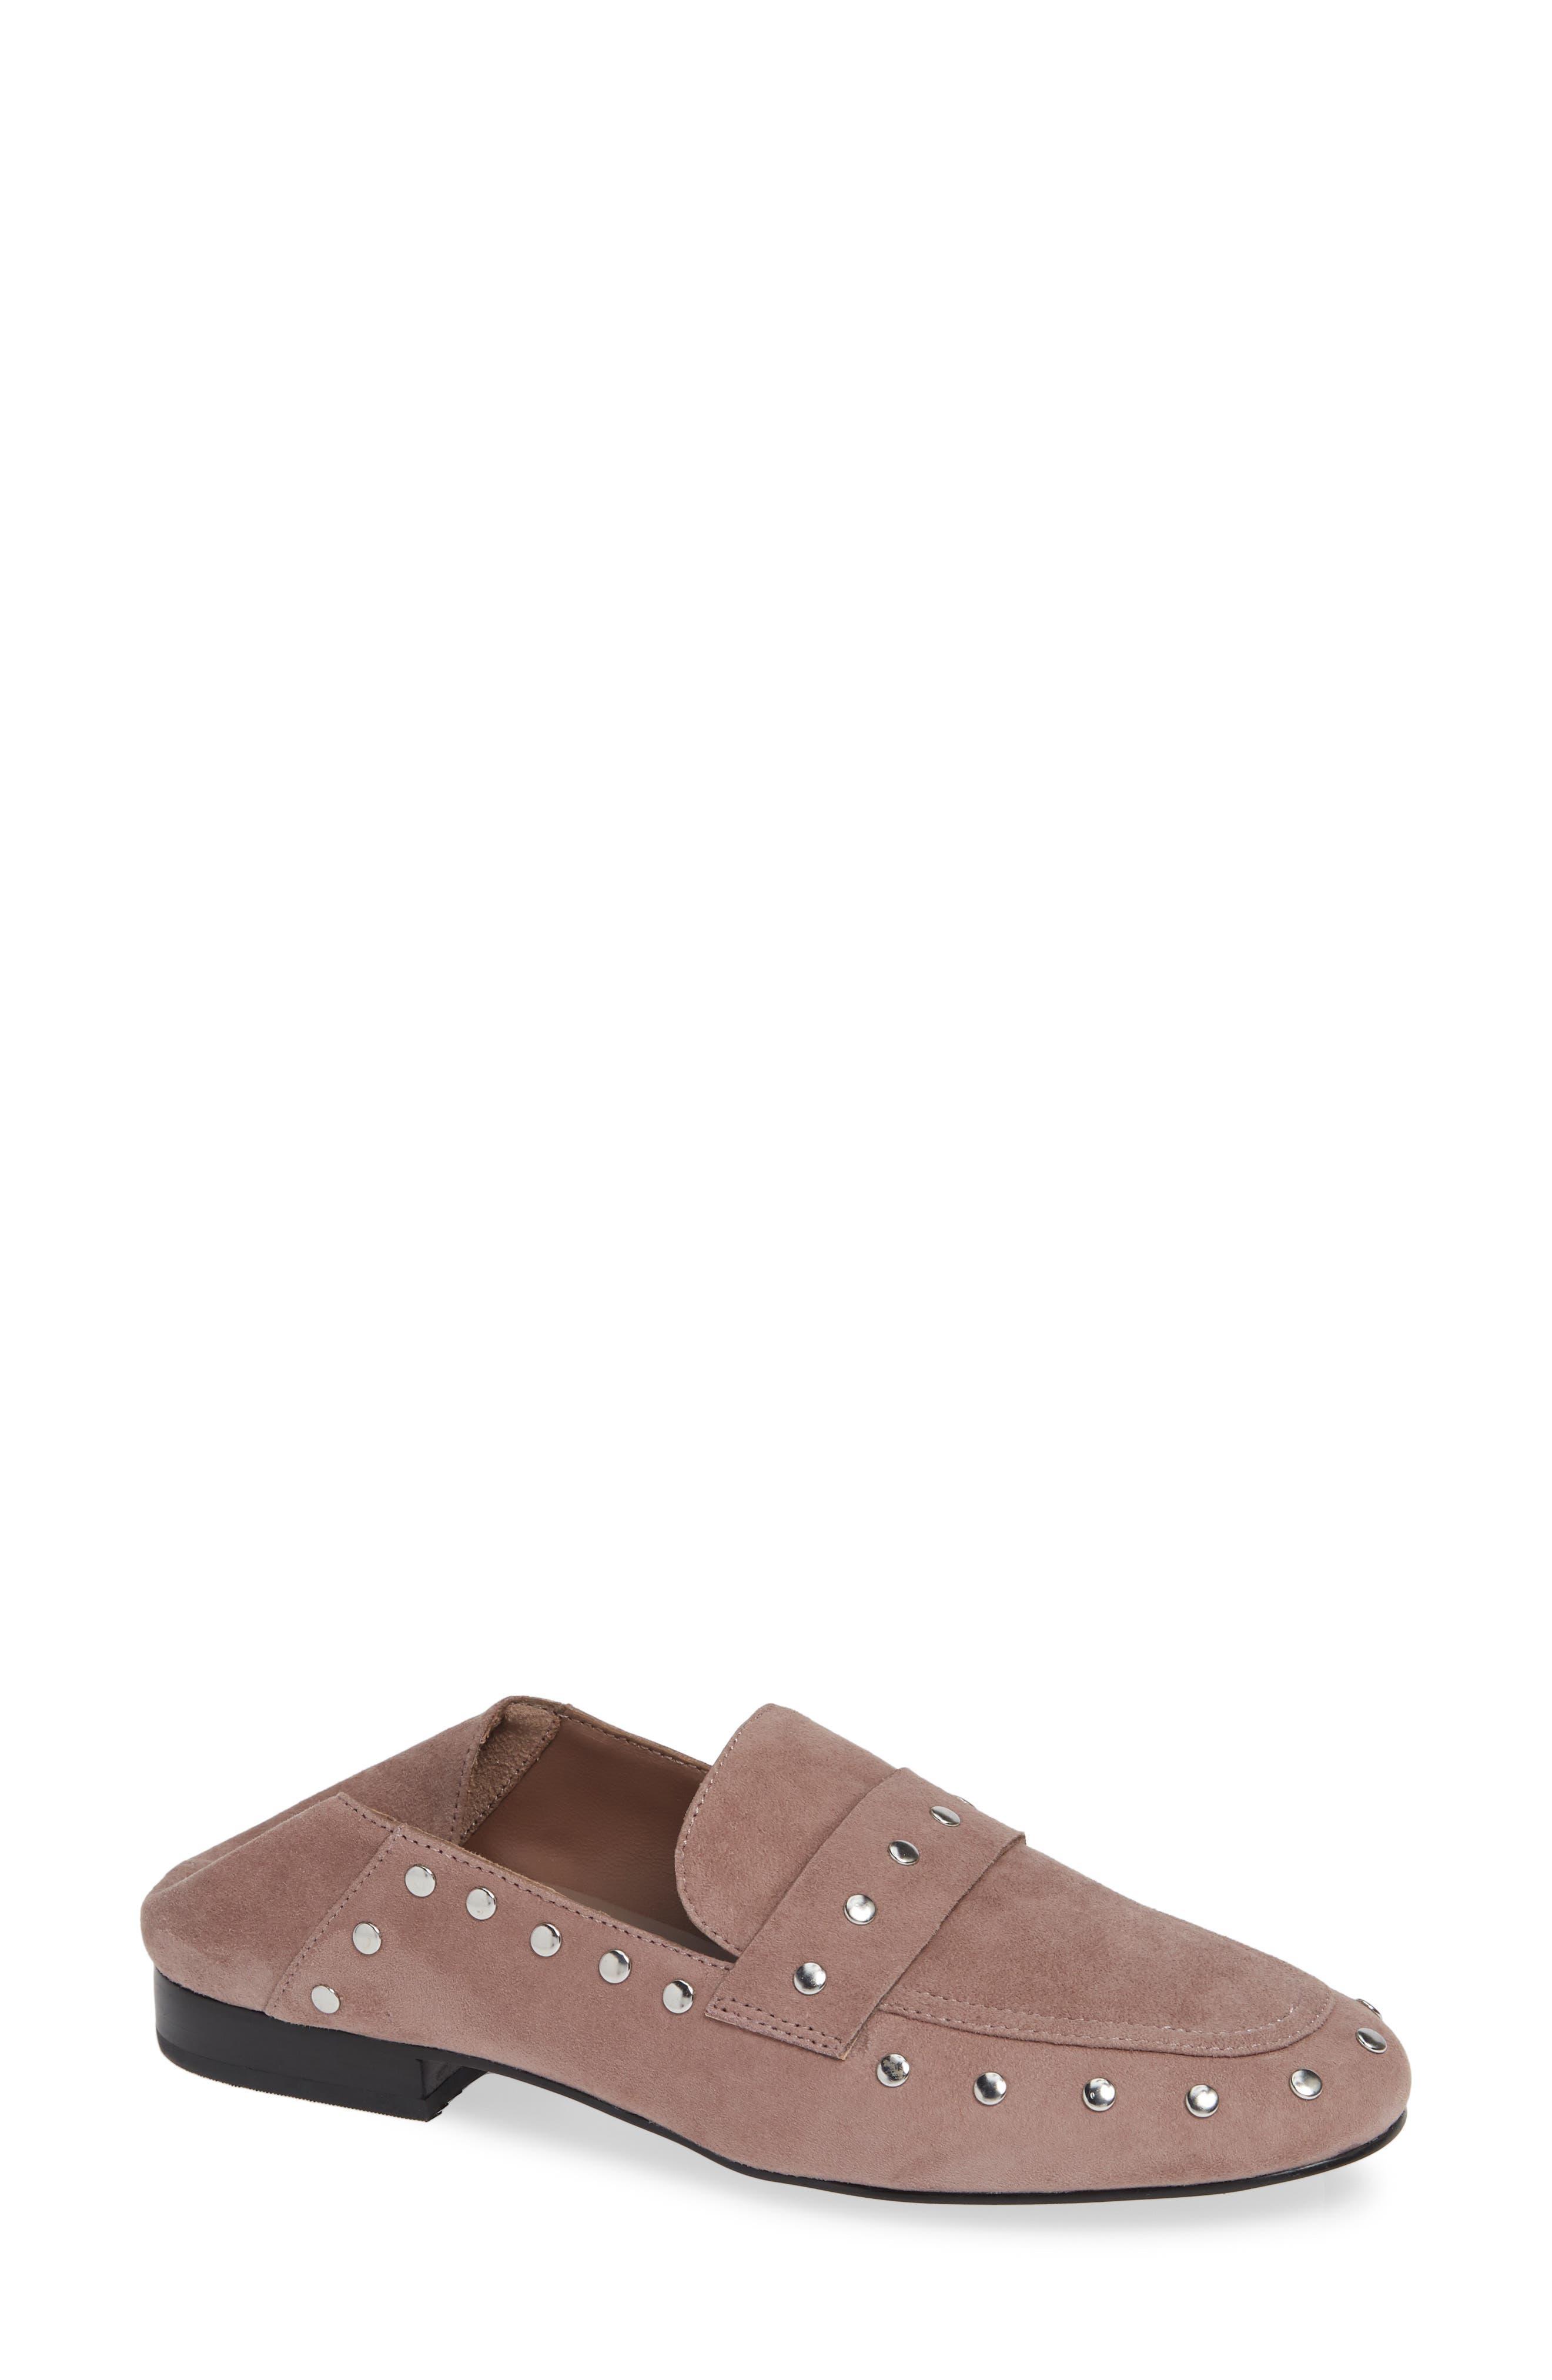 Black Suede Studio Alfee Studded Convertible Loafer, Pink